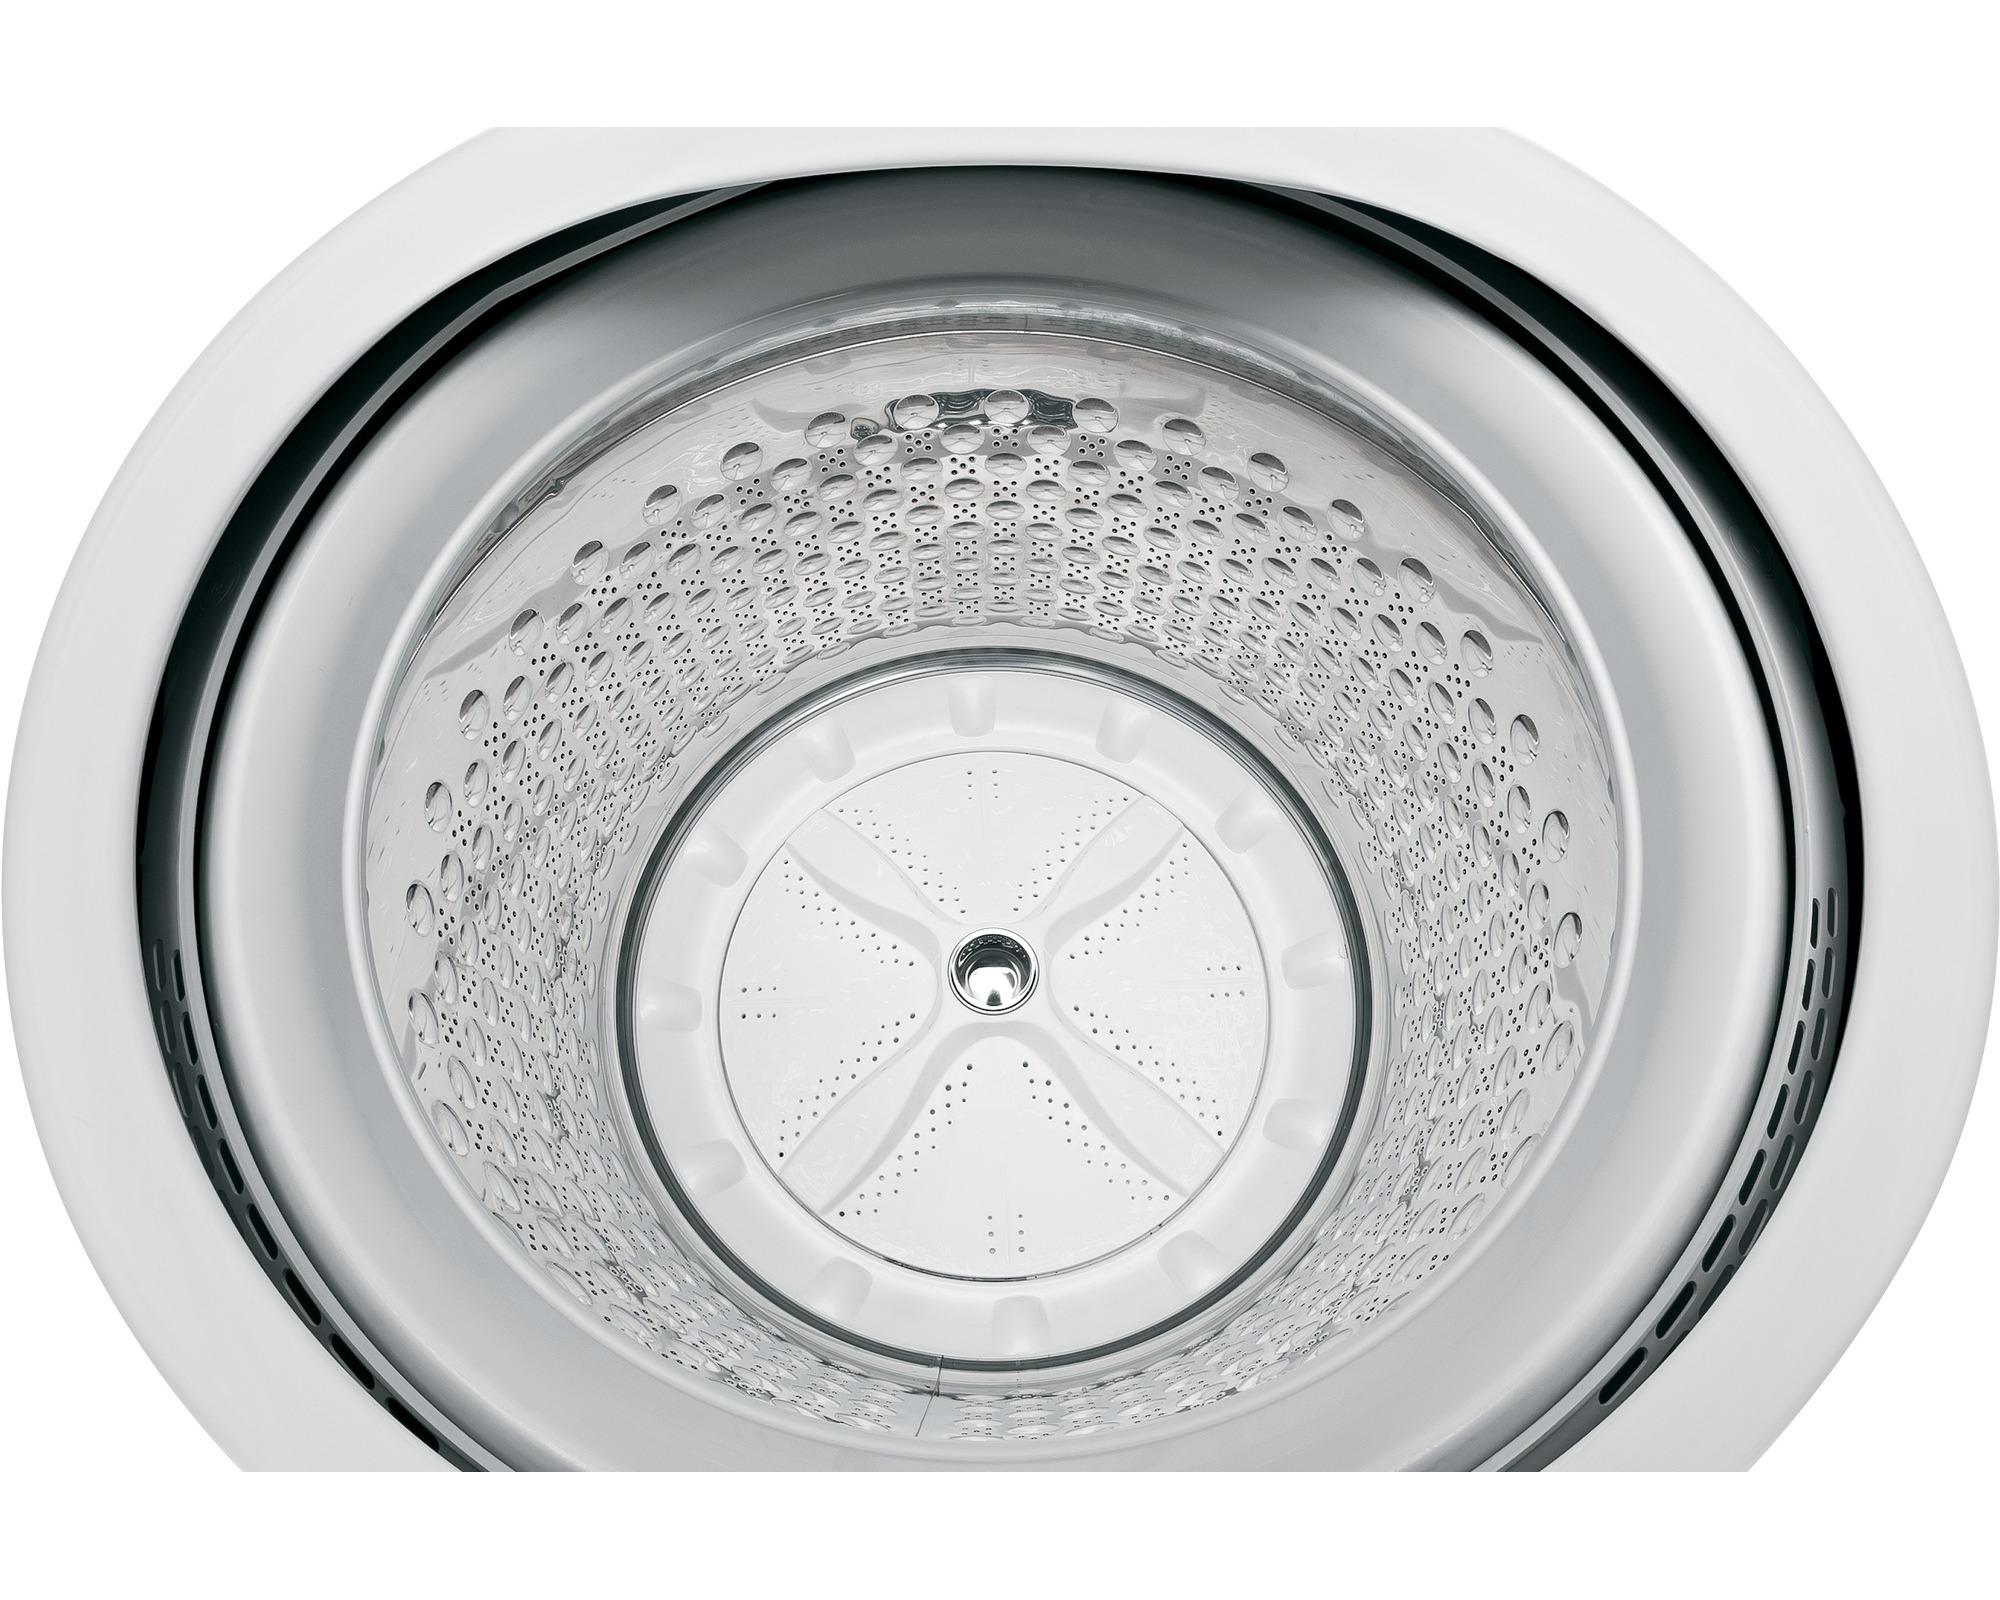 GE Appliances GTW810SPJMC 5.1 cu. ft. Top-Load Washer w/ Stainless Steel Basket - Metallic